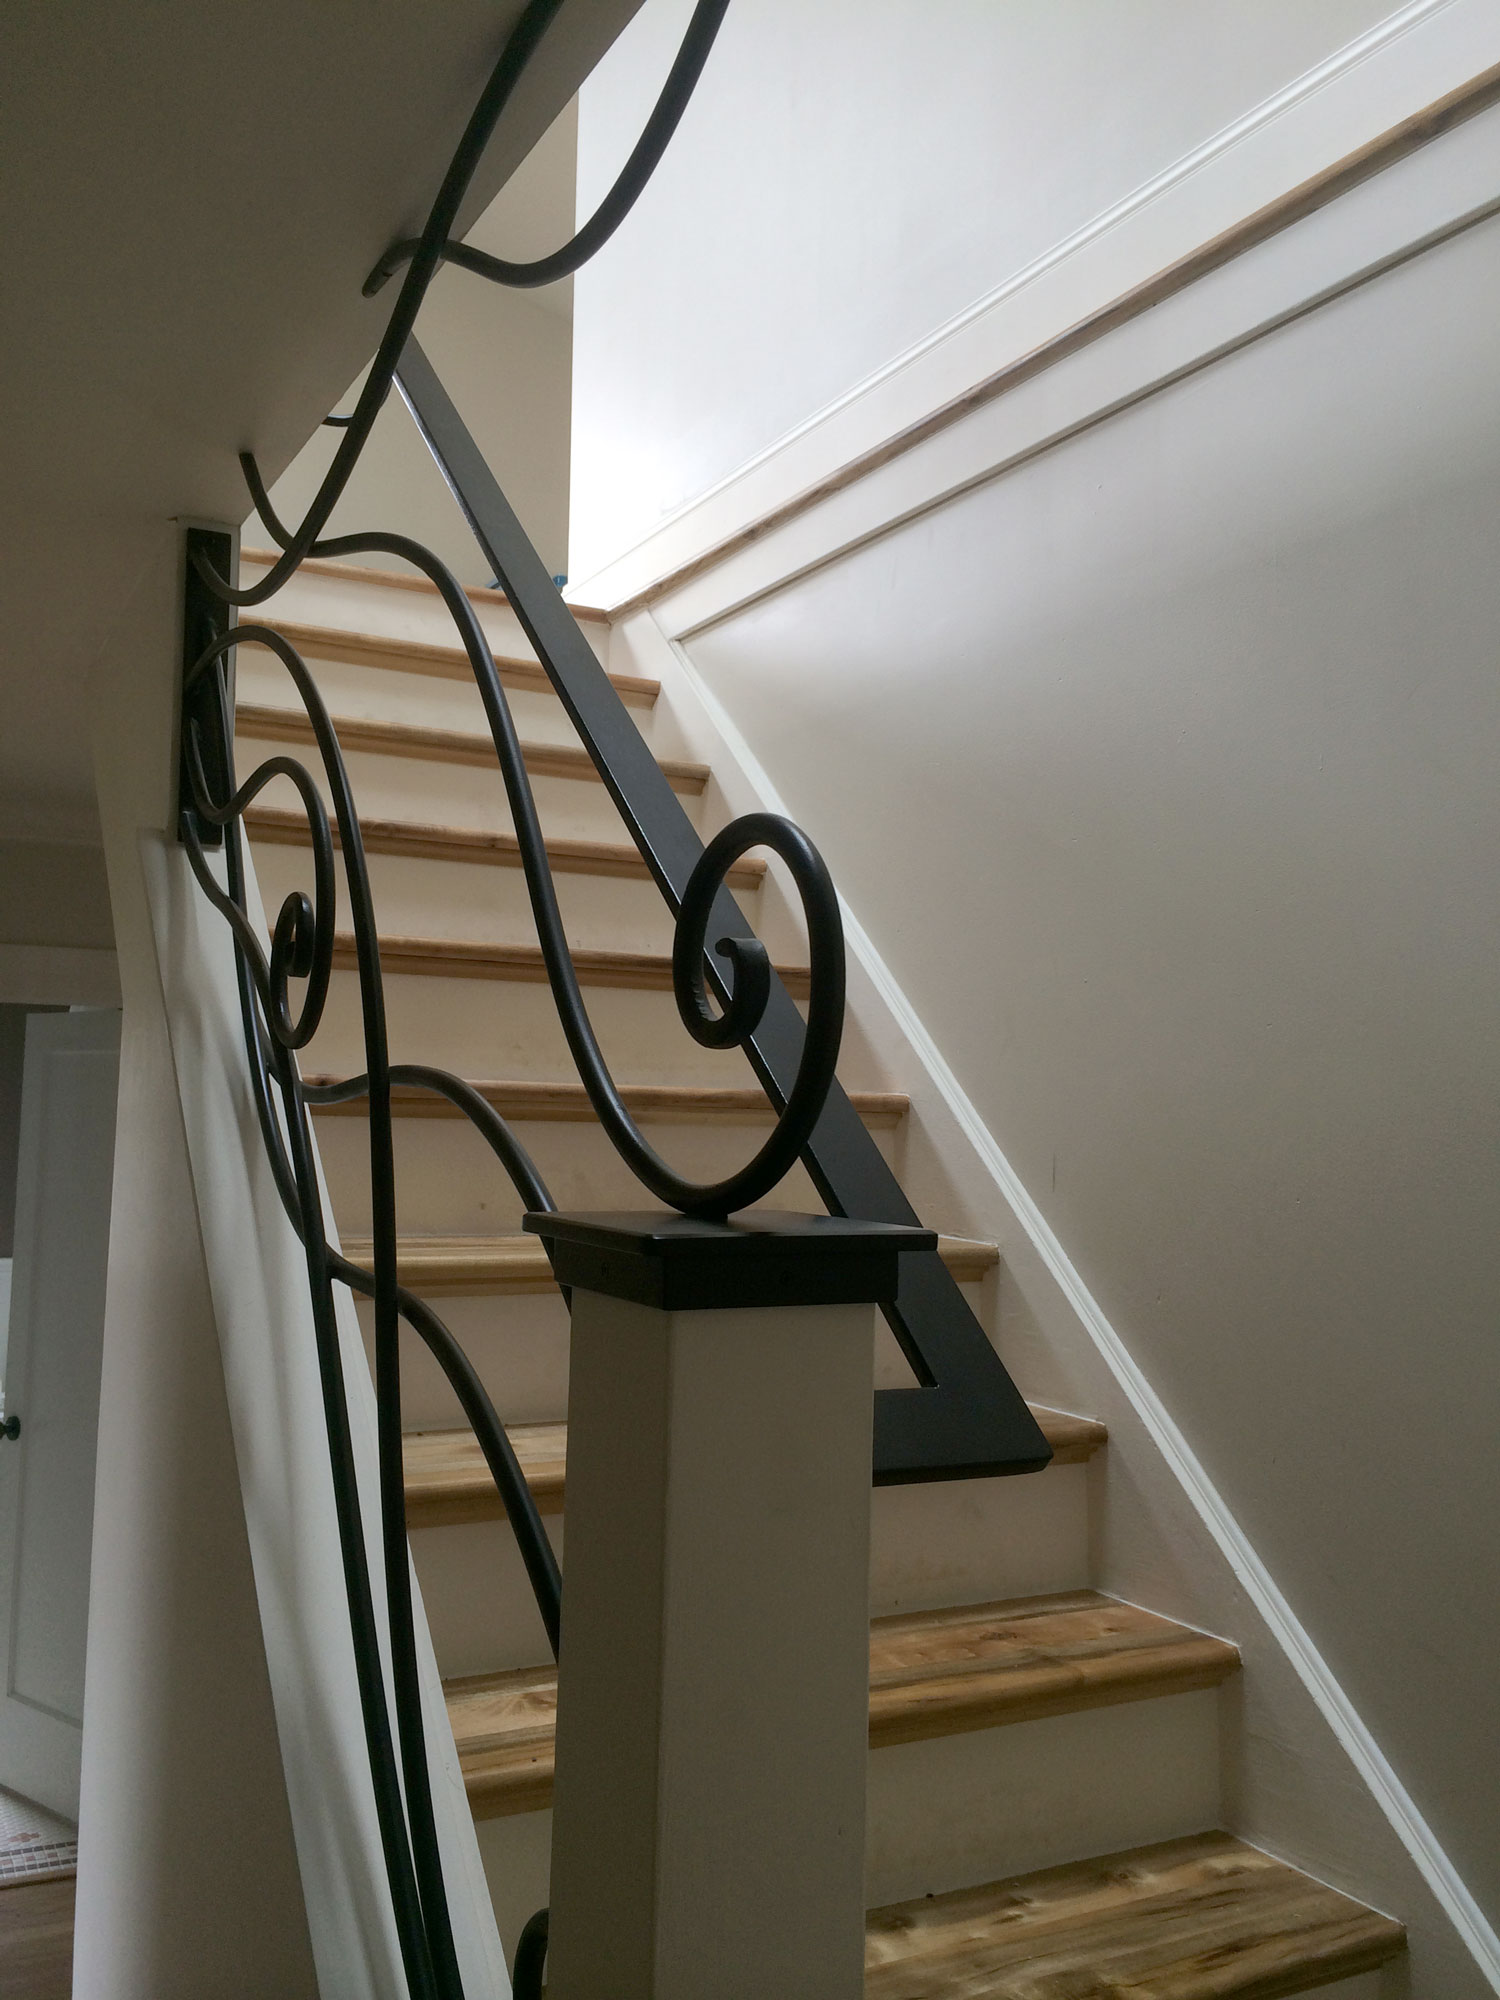 Ornamental Staircase Railings Side View - Seattle, WA